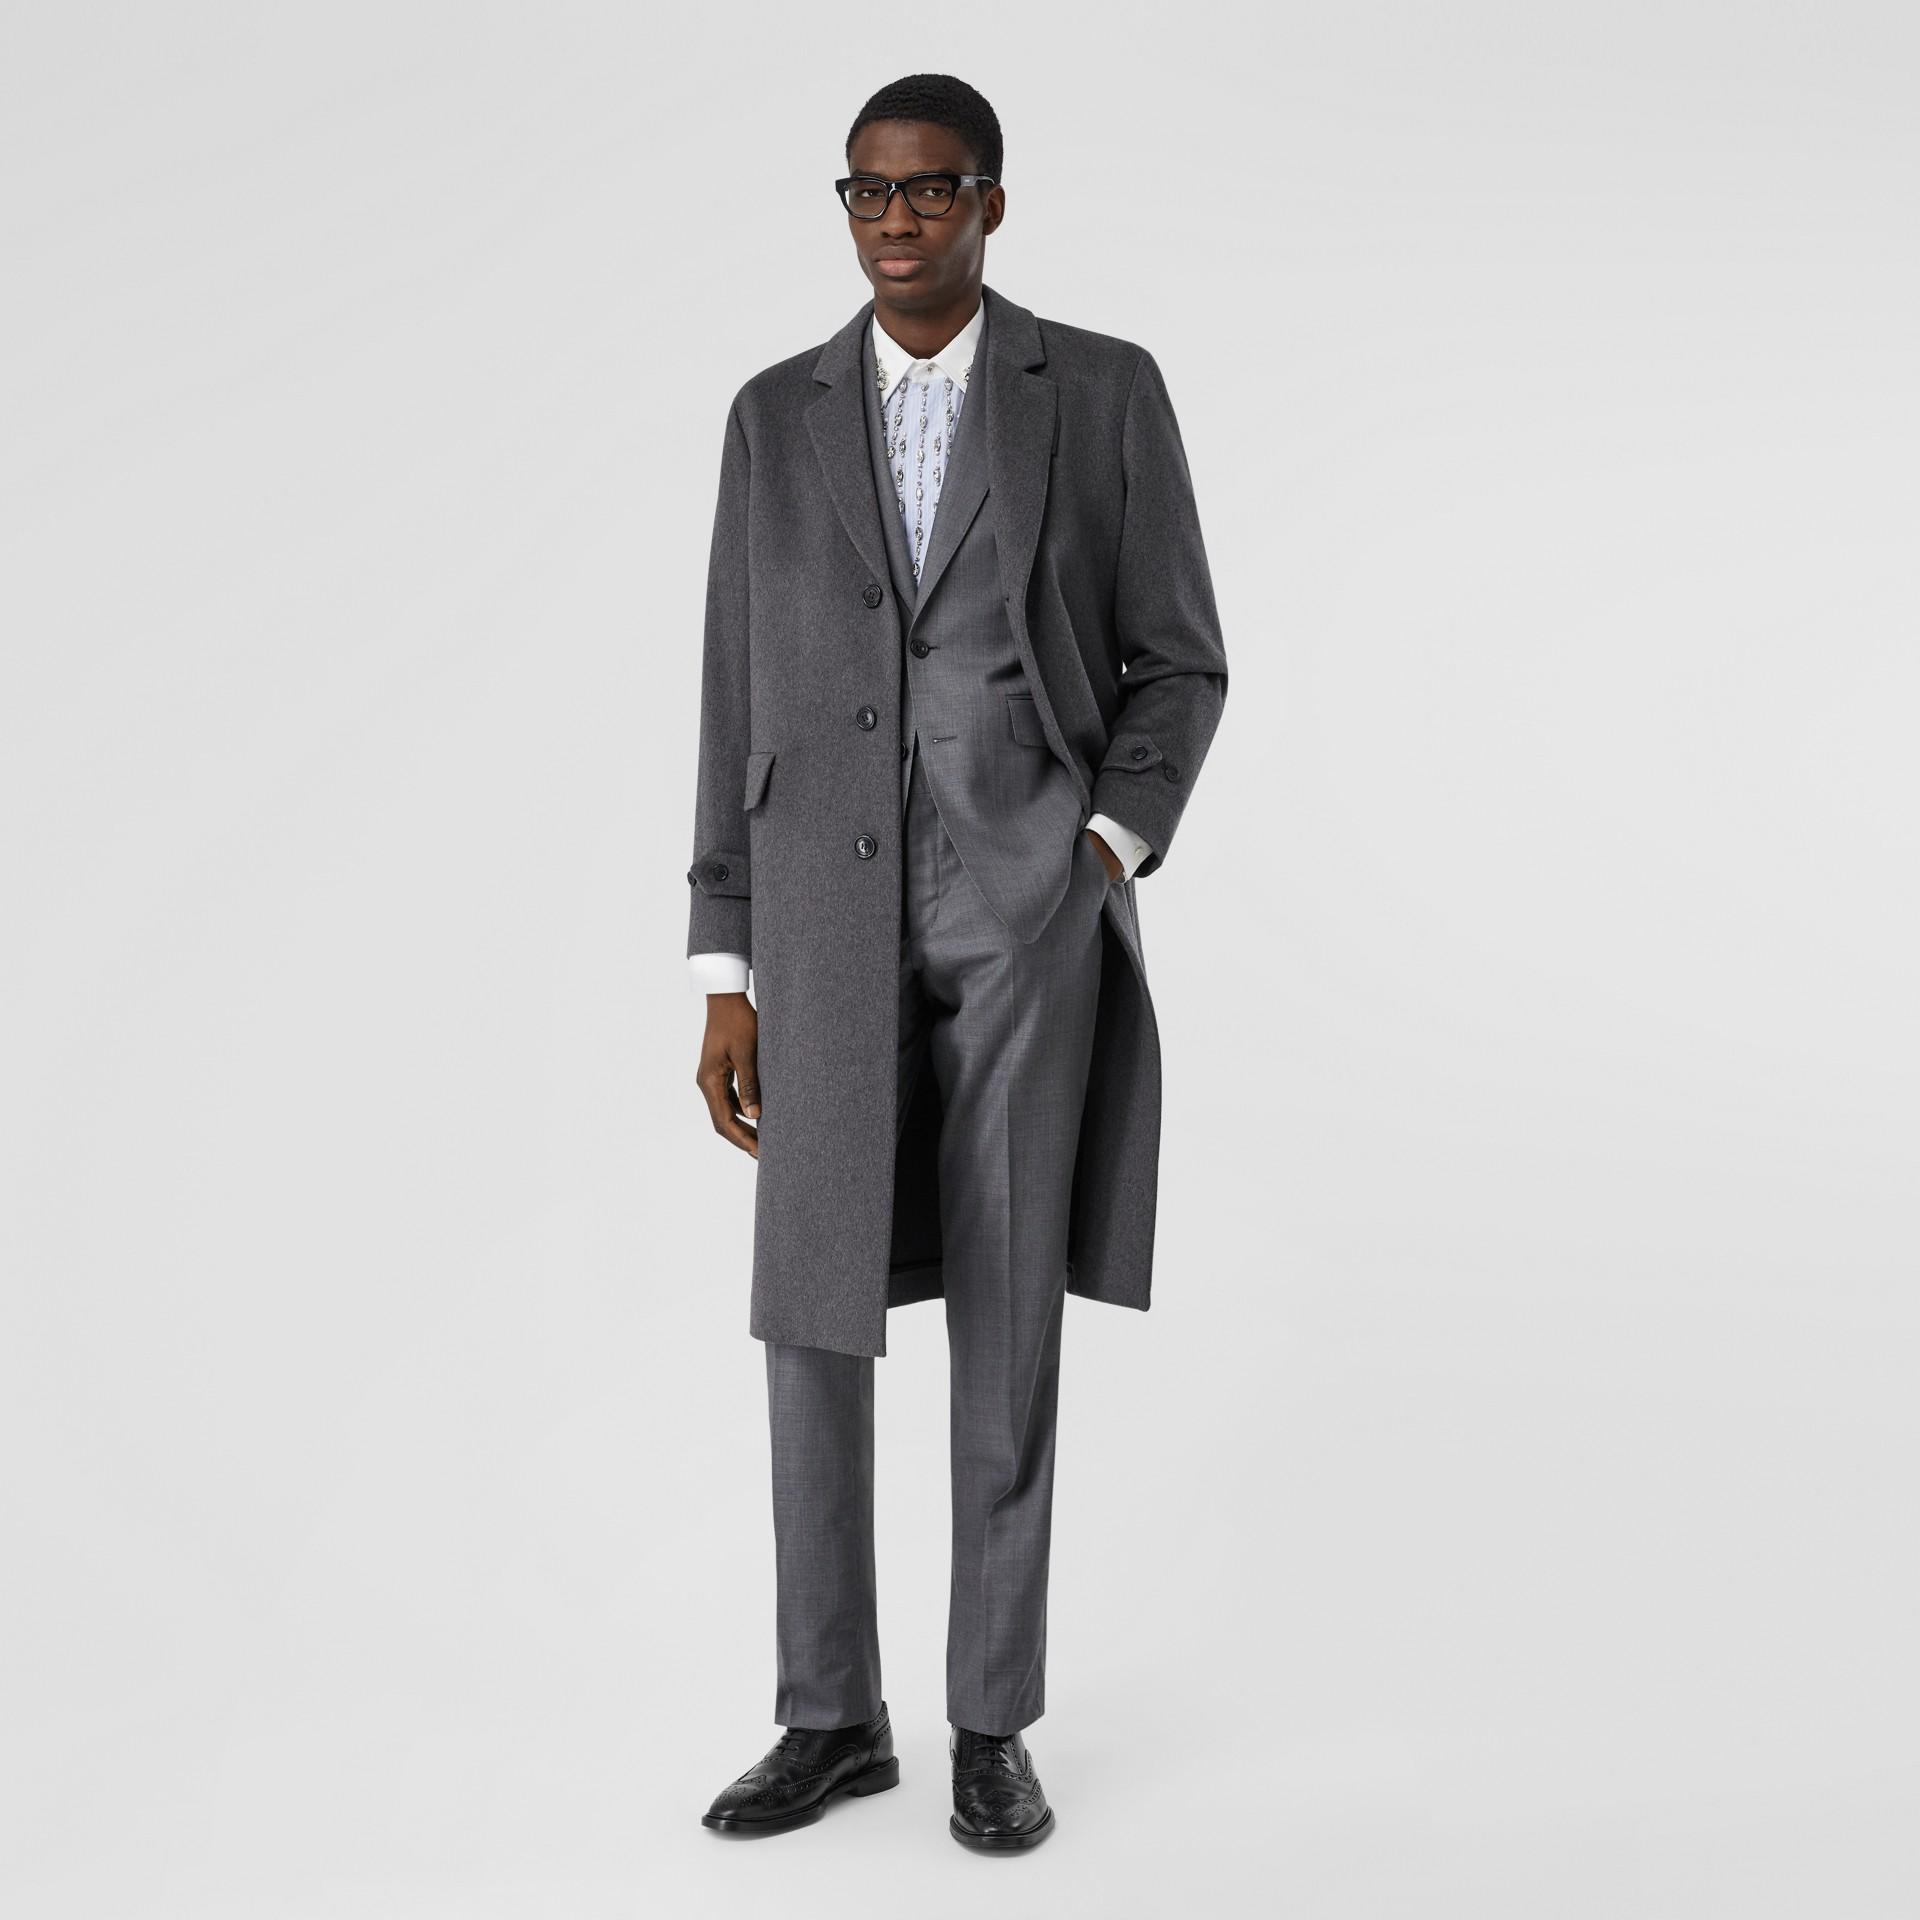 Cashmere Lab Coat in Pewter Melange - Men   Burberry - gallery image 0